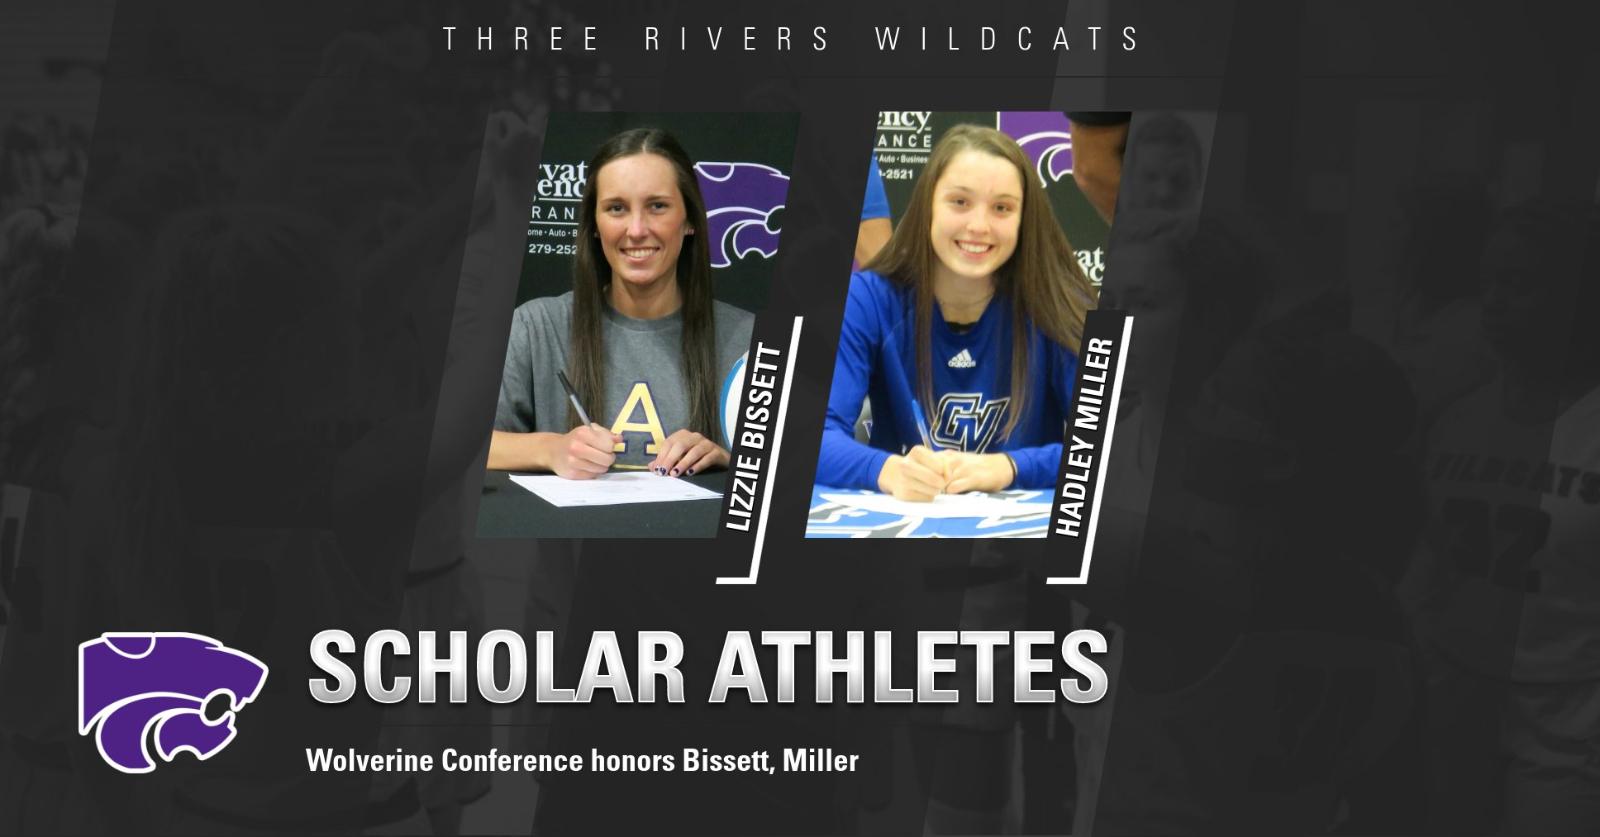 Bissett, Miller named Scholar-Athletes by the Wolverine Conference